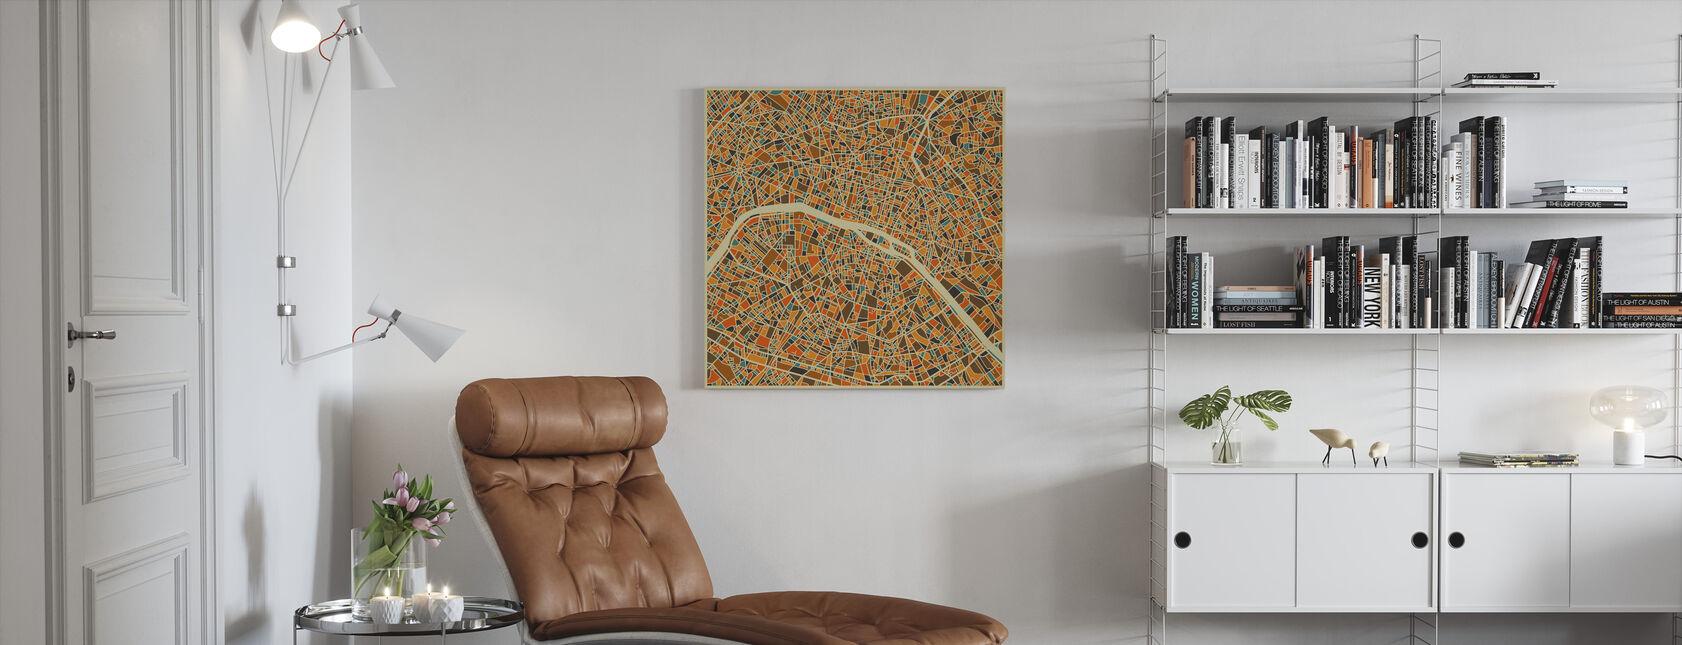 Flerfarget kart - Paris - Lerretsbilde - Stue